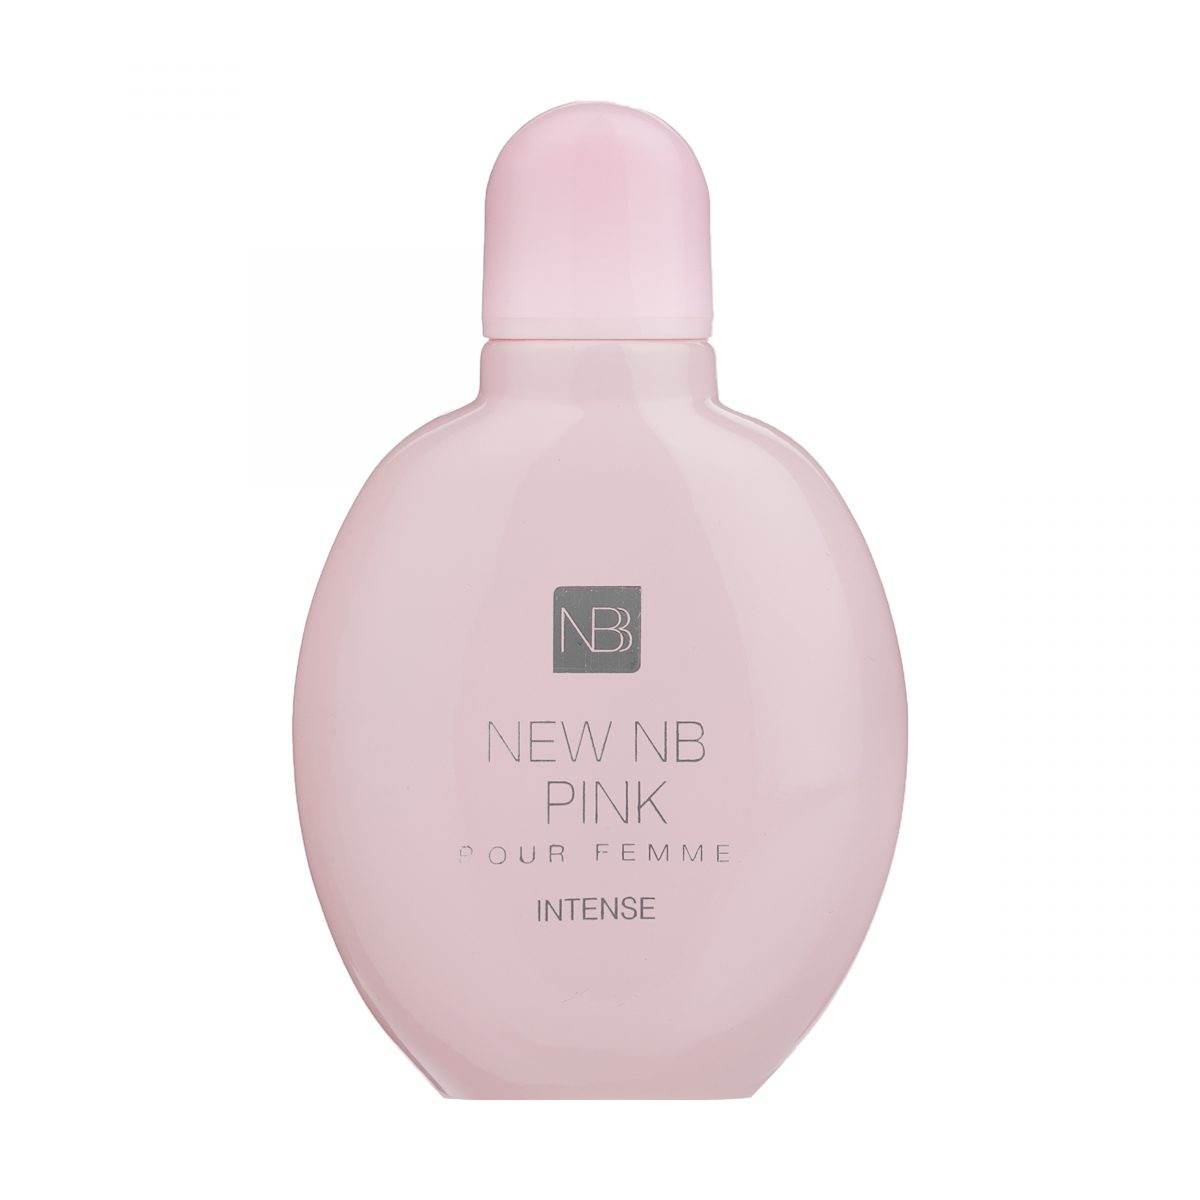 ادو پرفیوم زنانه رودیر مدل New Nb Pink حجم 100 میلی لیتر